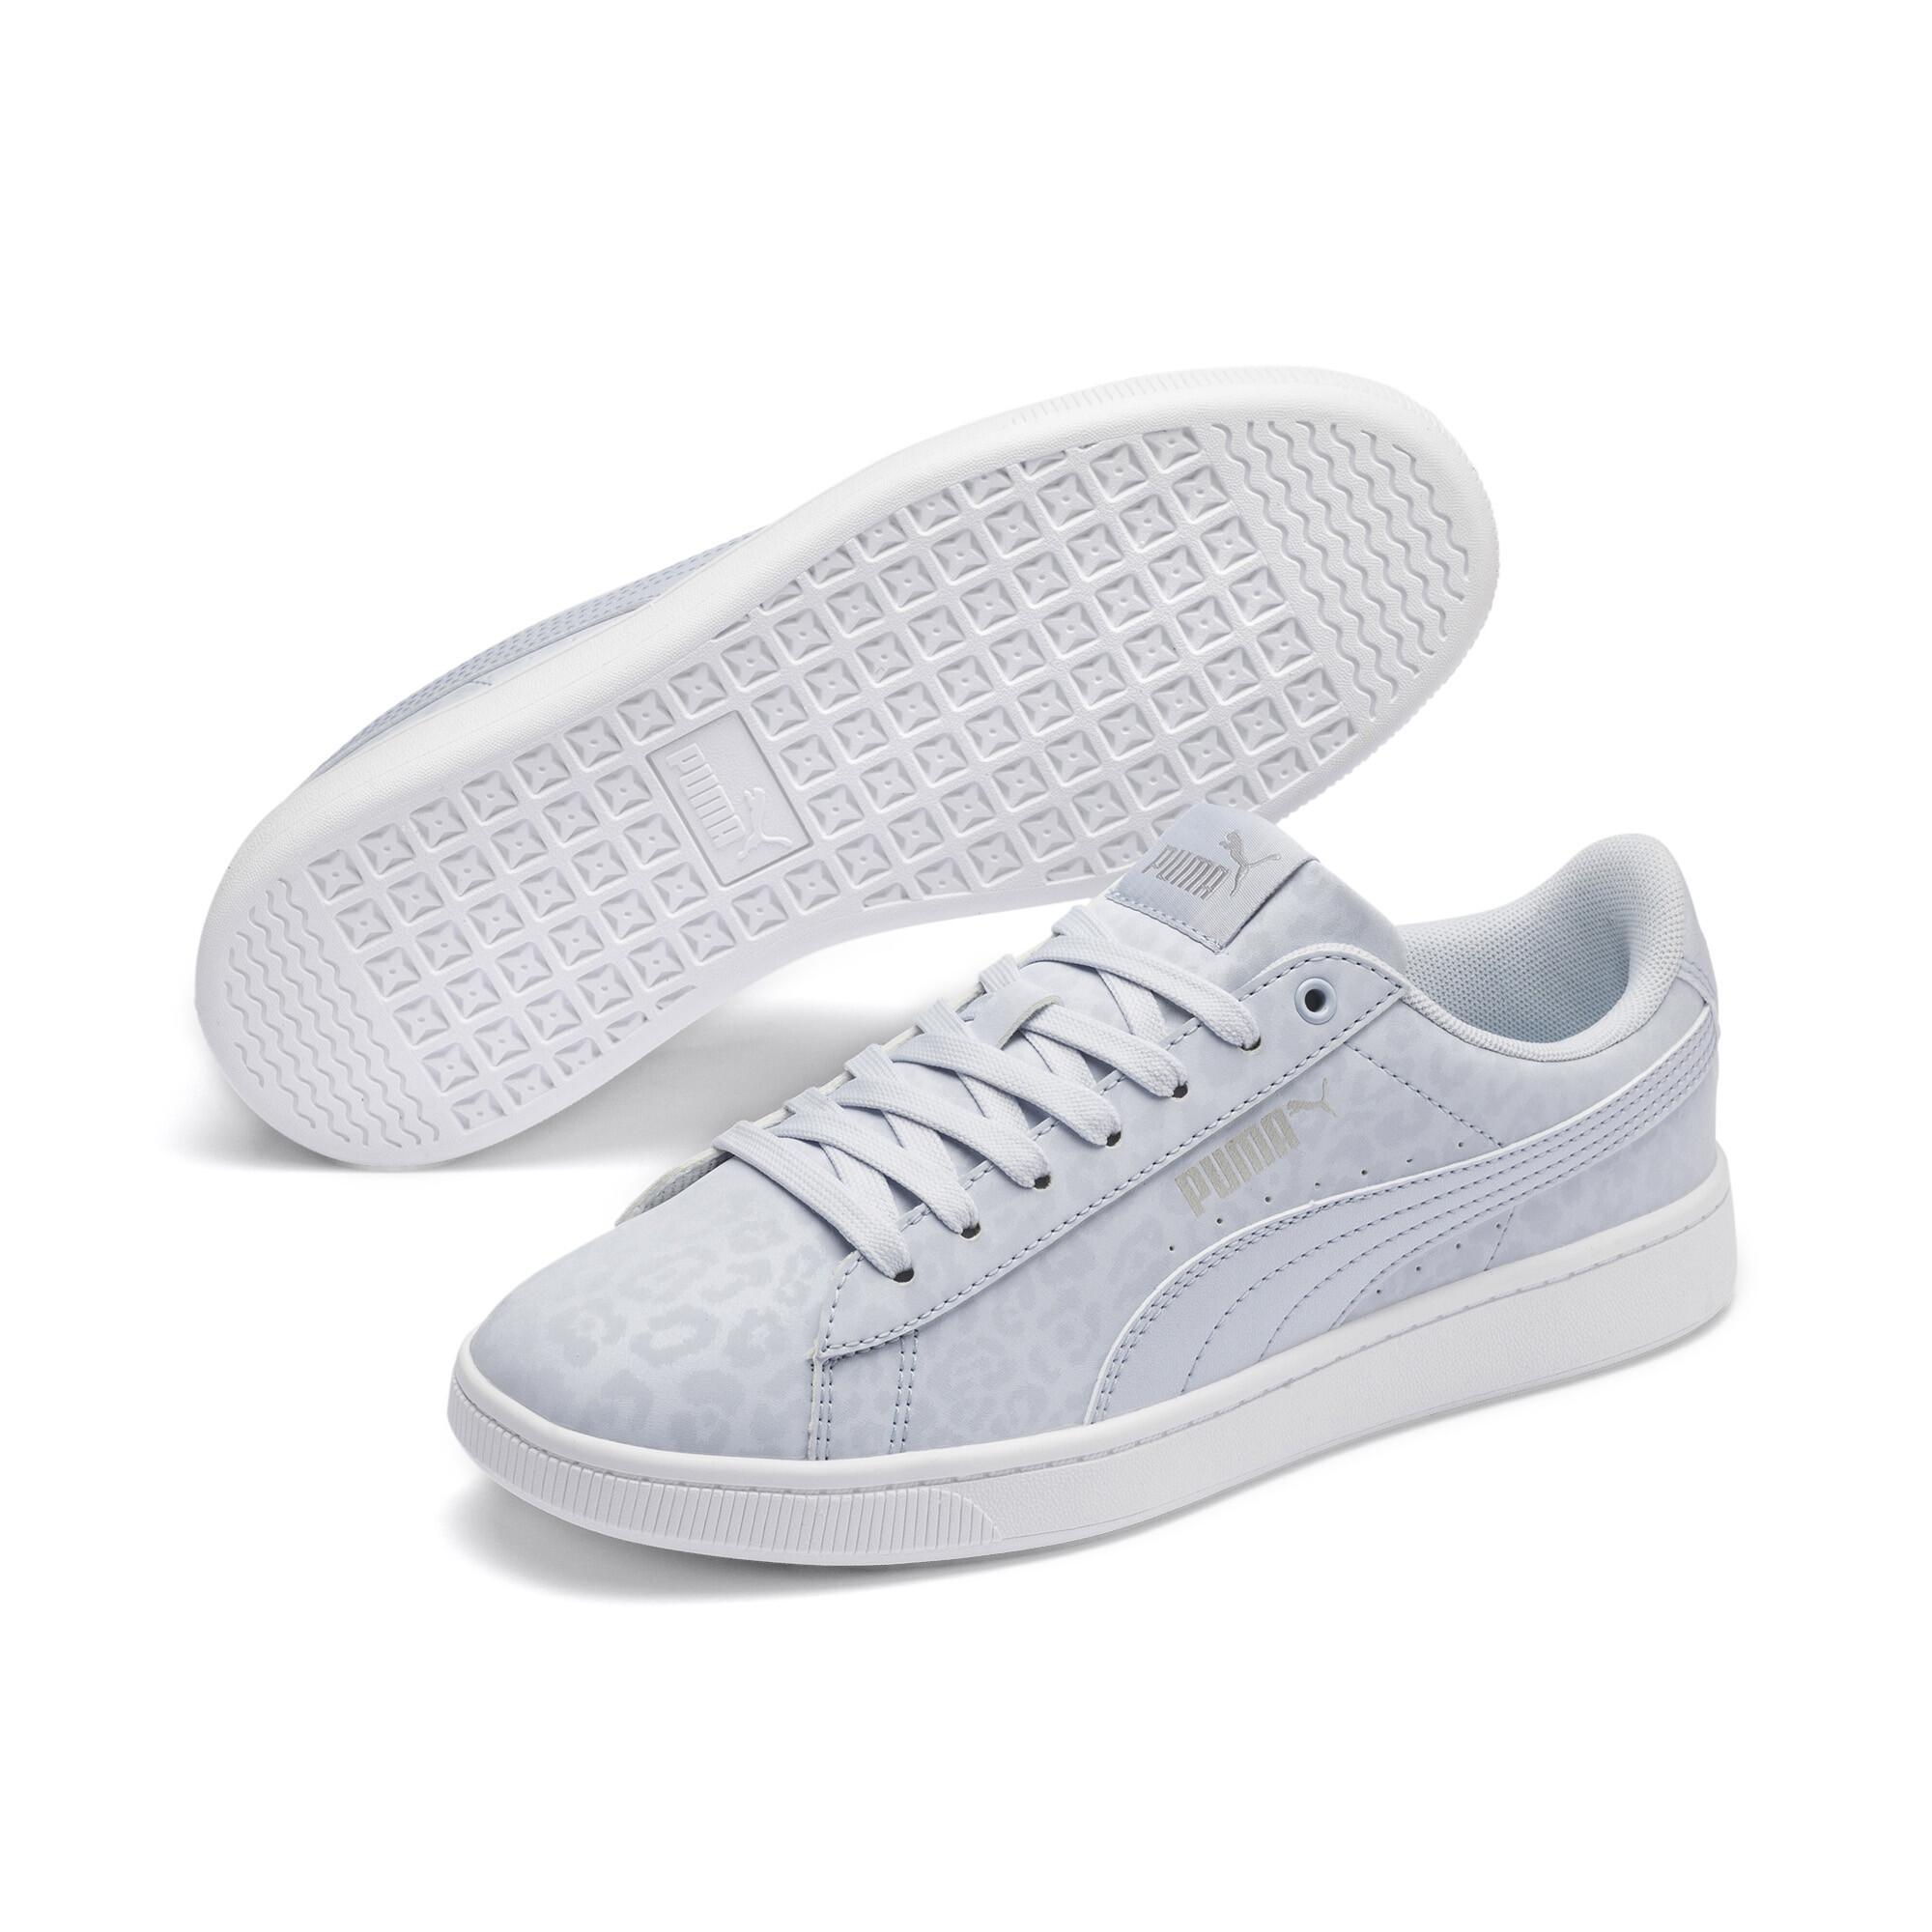 Cena obniżona duża obniżka kupić Details about PUMA PUMA Vikky v2 Wildcat Women's Sneakers Women Shoe Basics